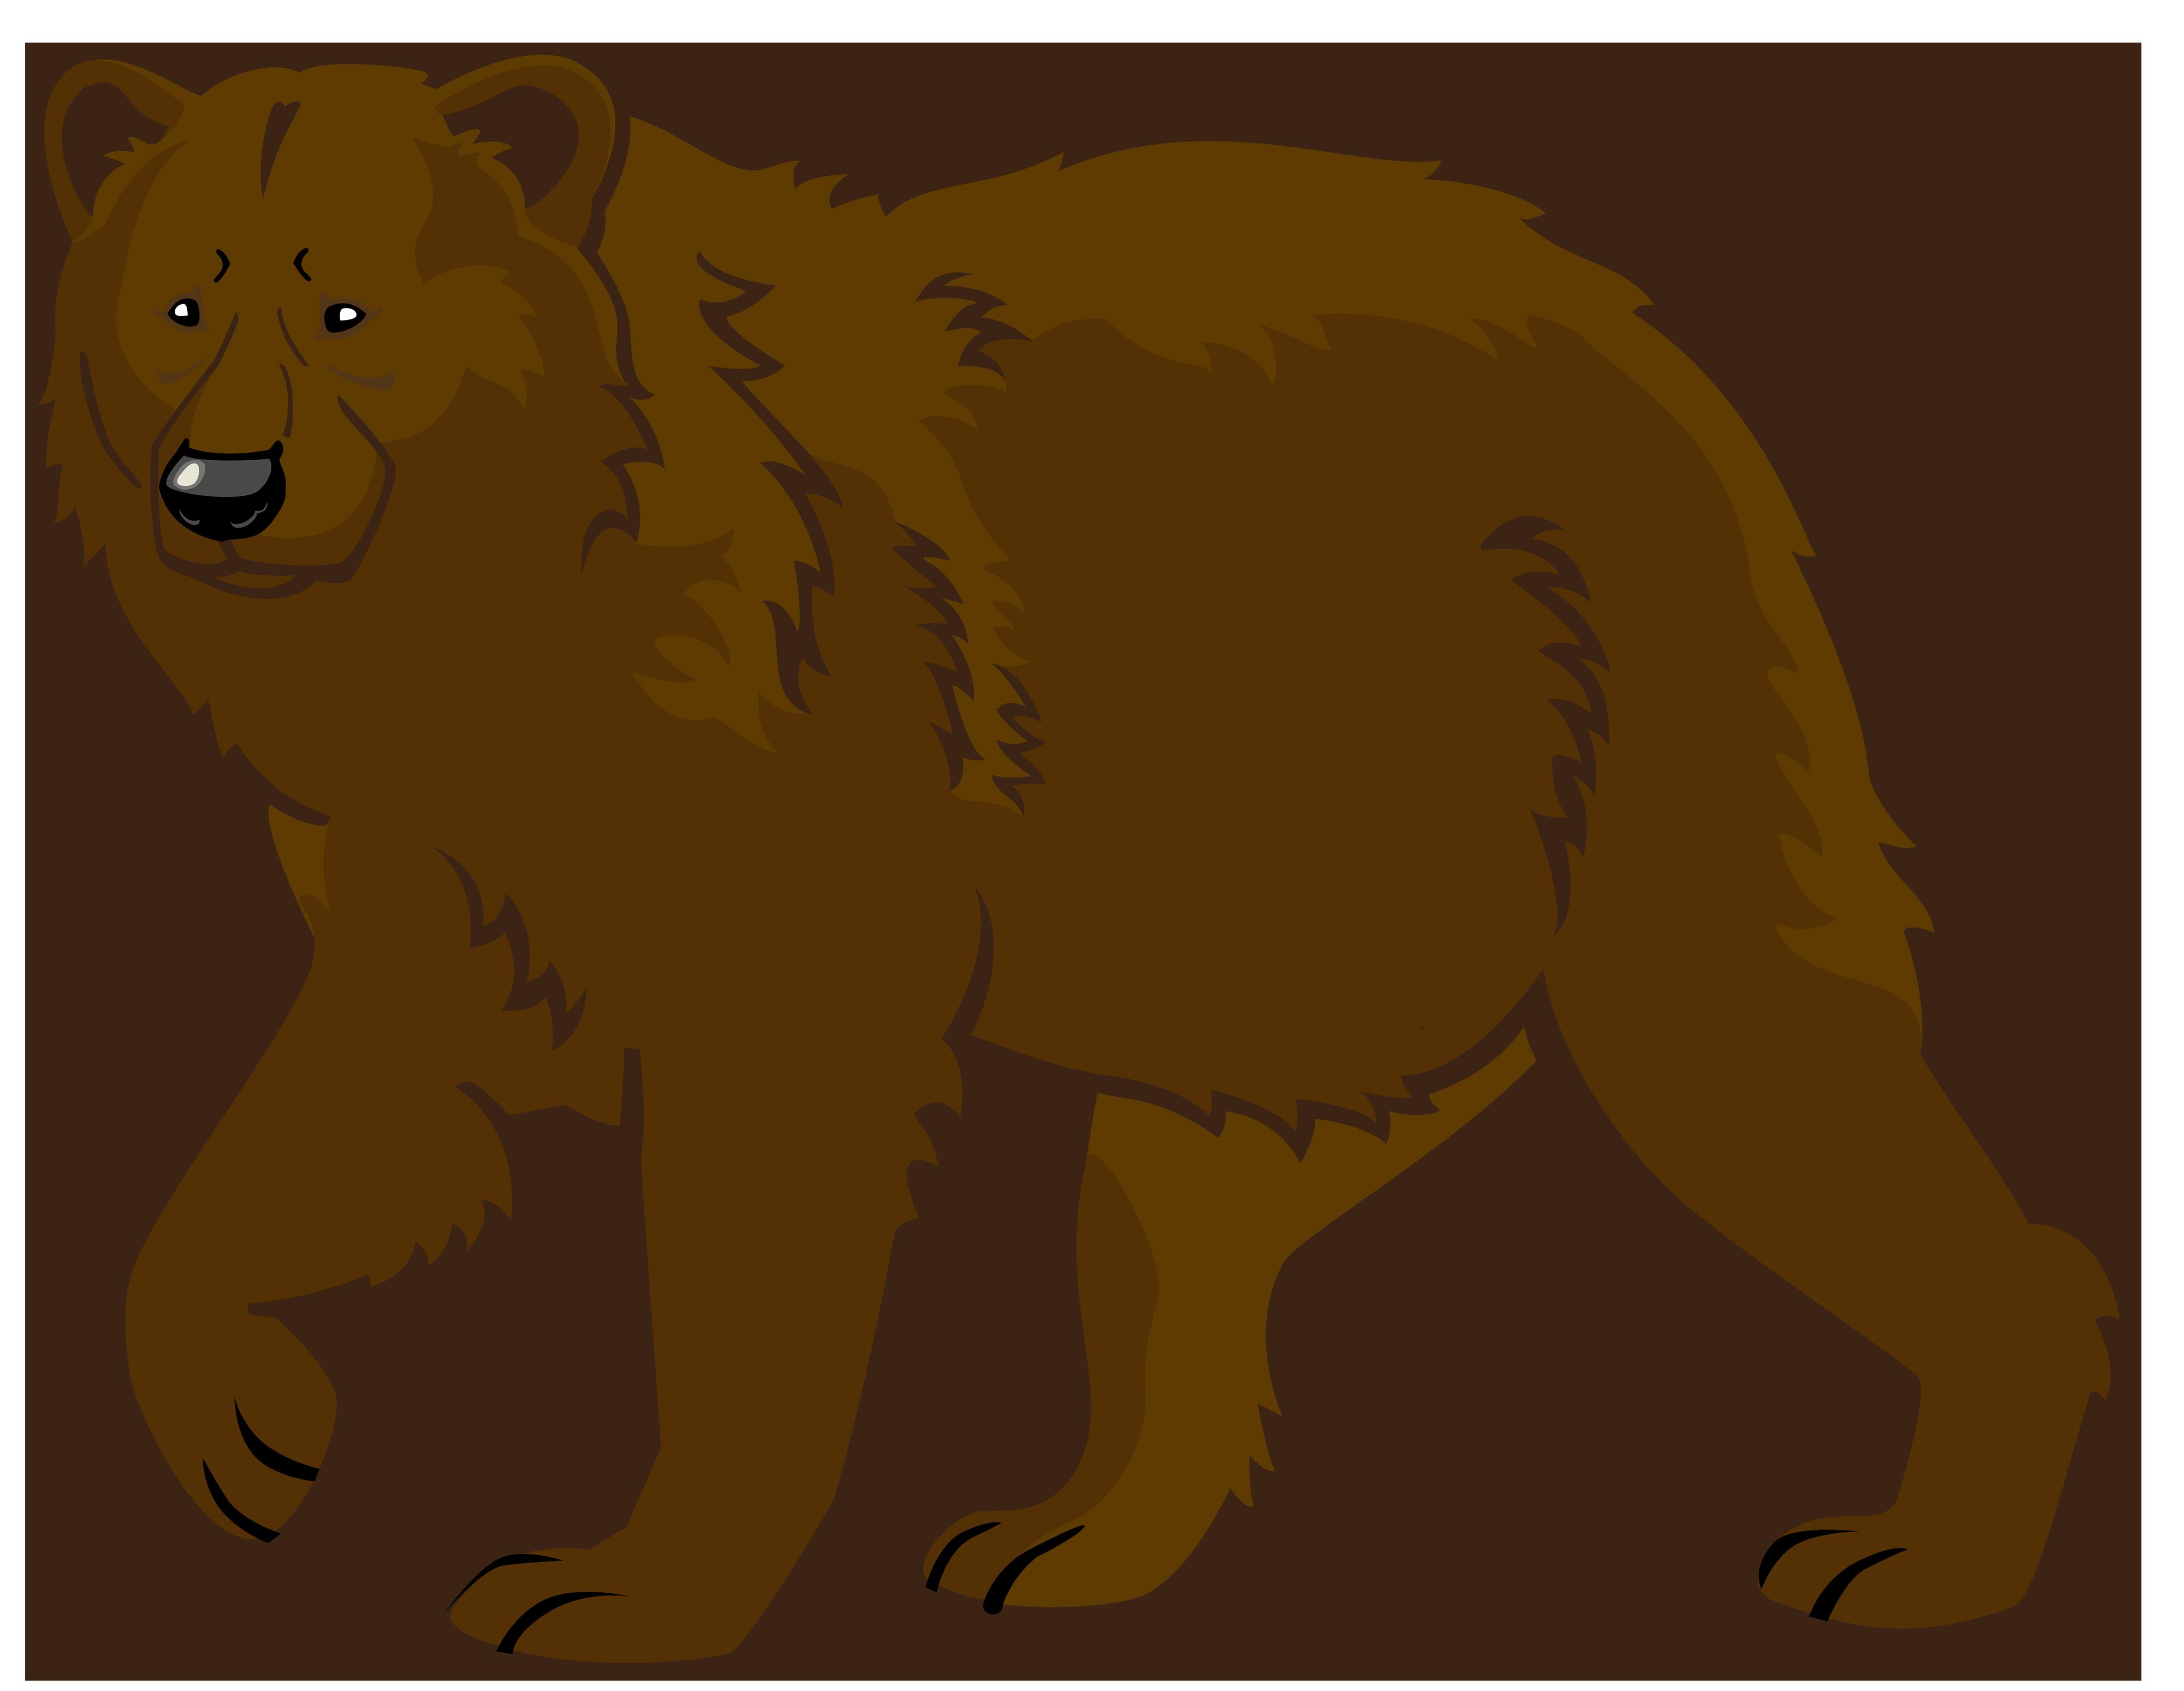 4000x3097 Free Bear Clip Art Polar Bear Clipart Pics 2 Clipartwiz 2